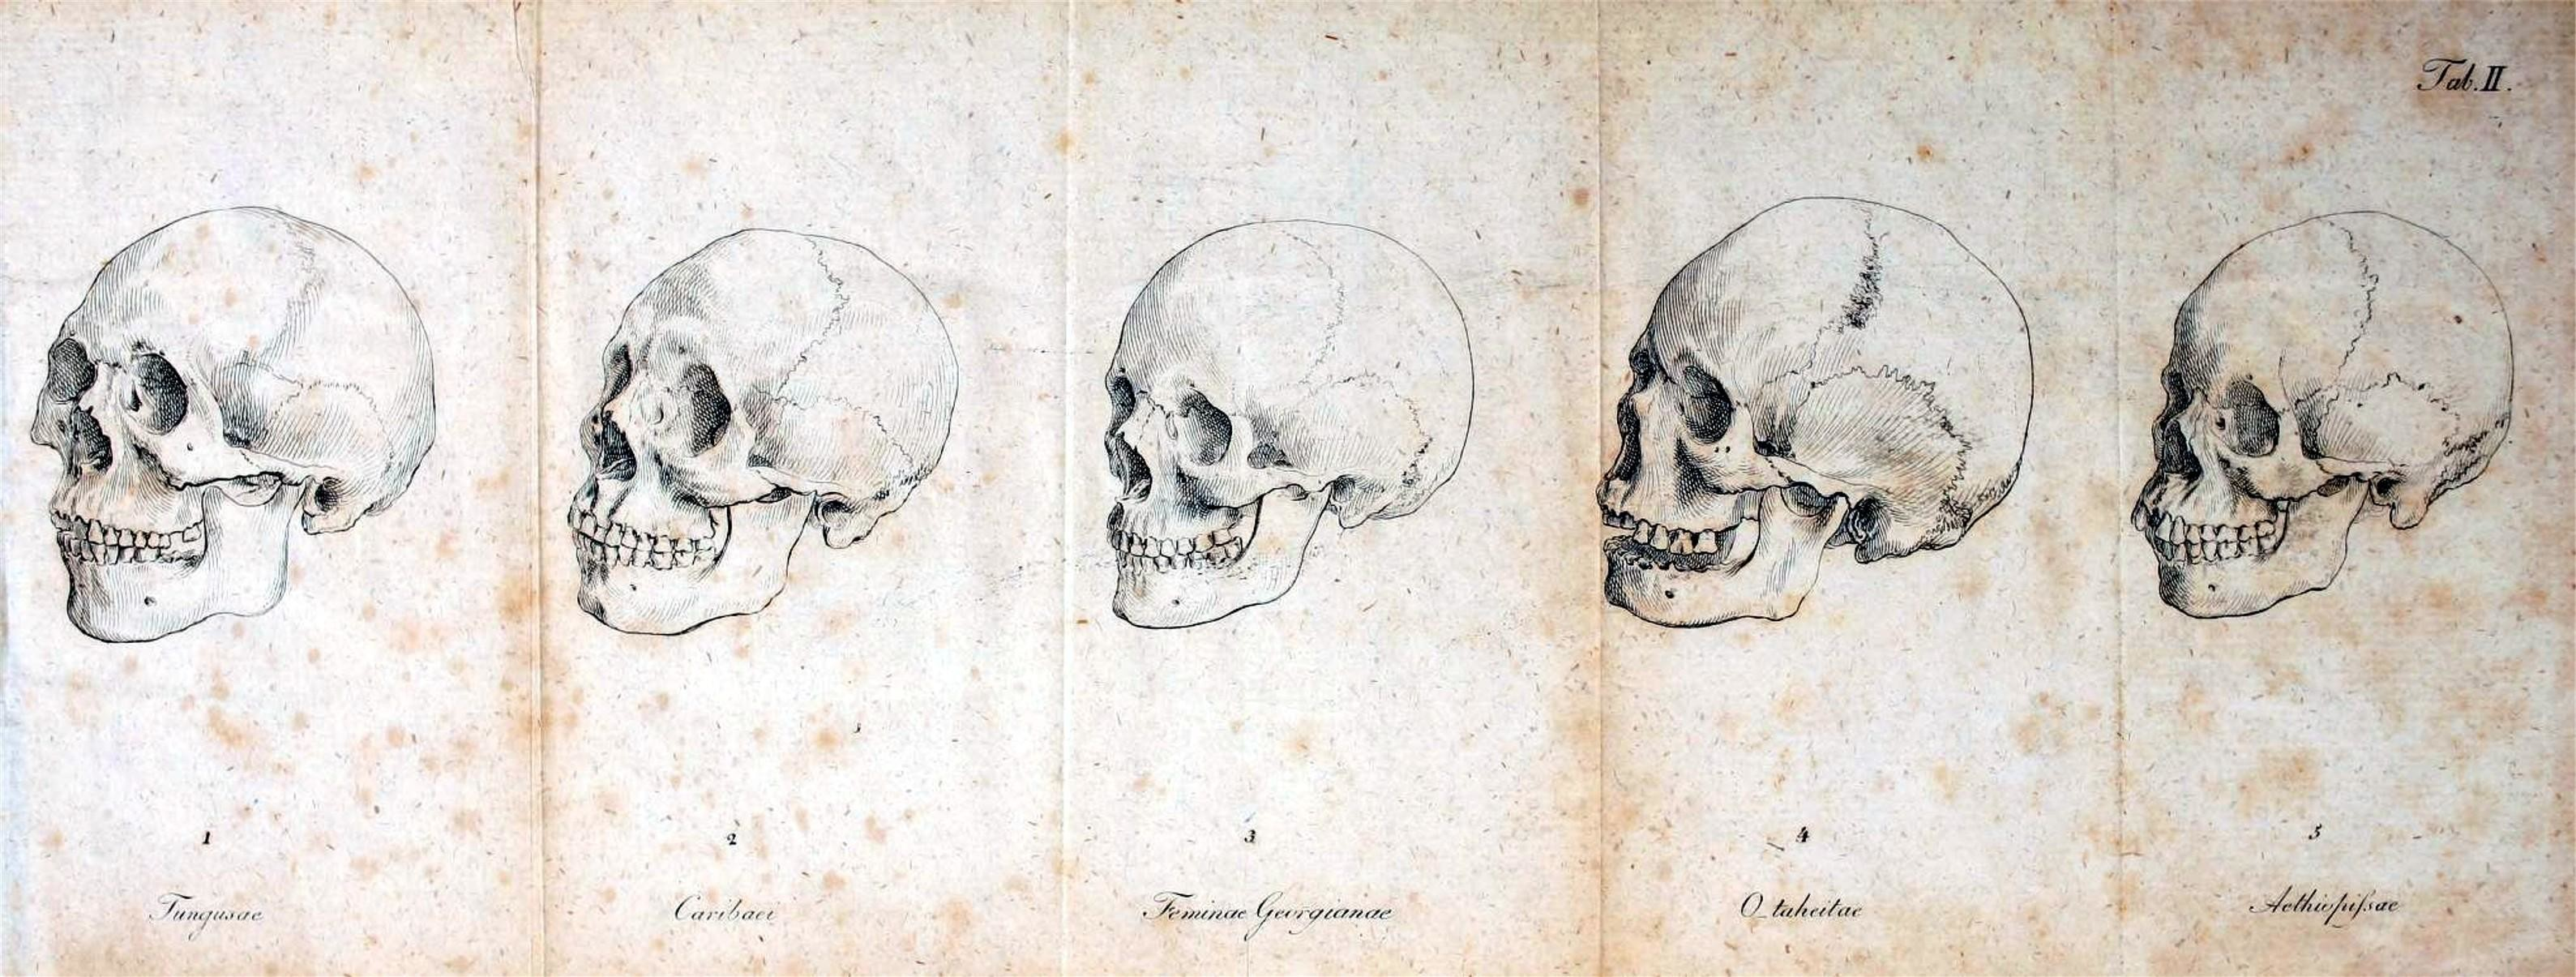 Human Anatomy Wallpaper (54+ images)